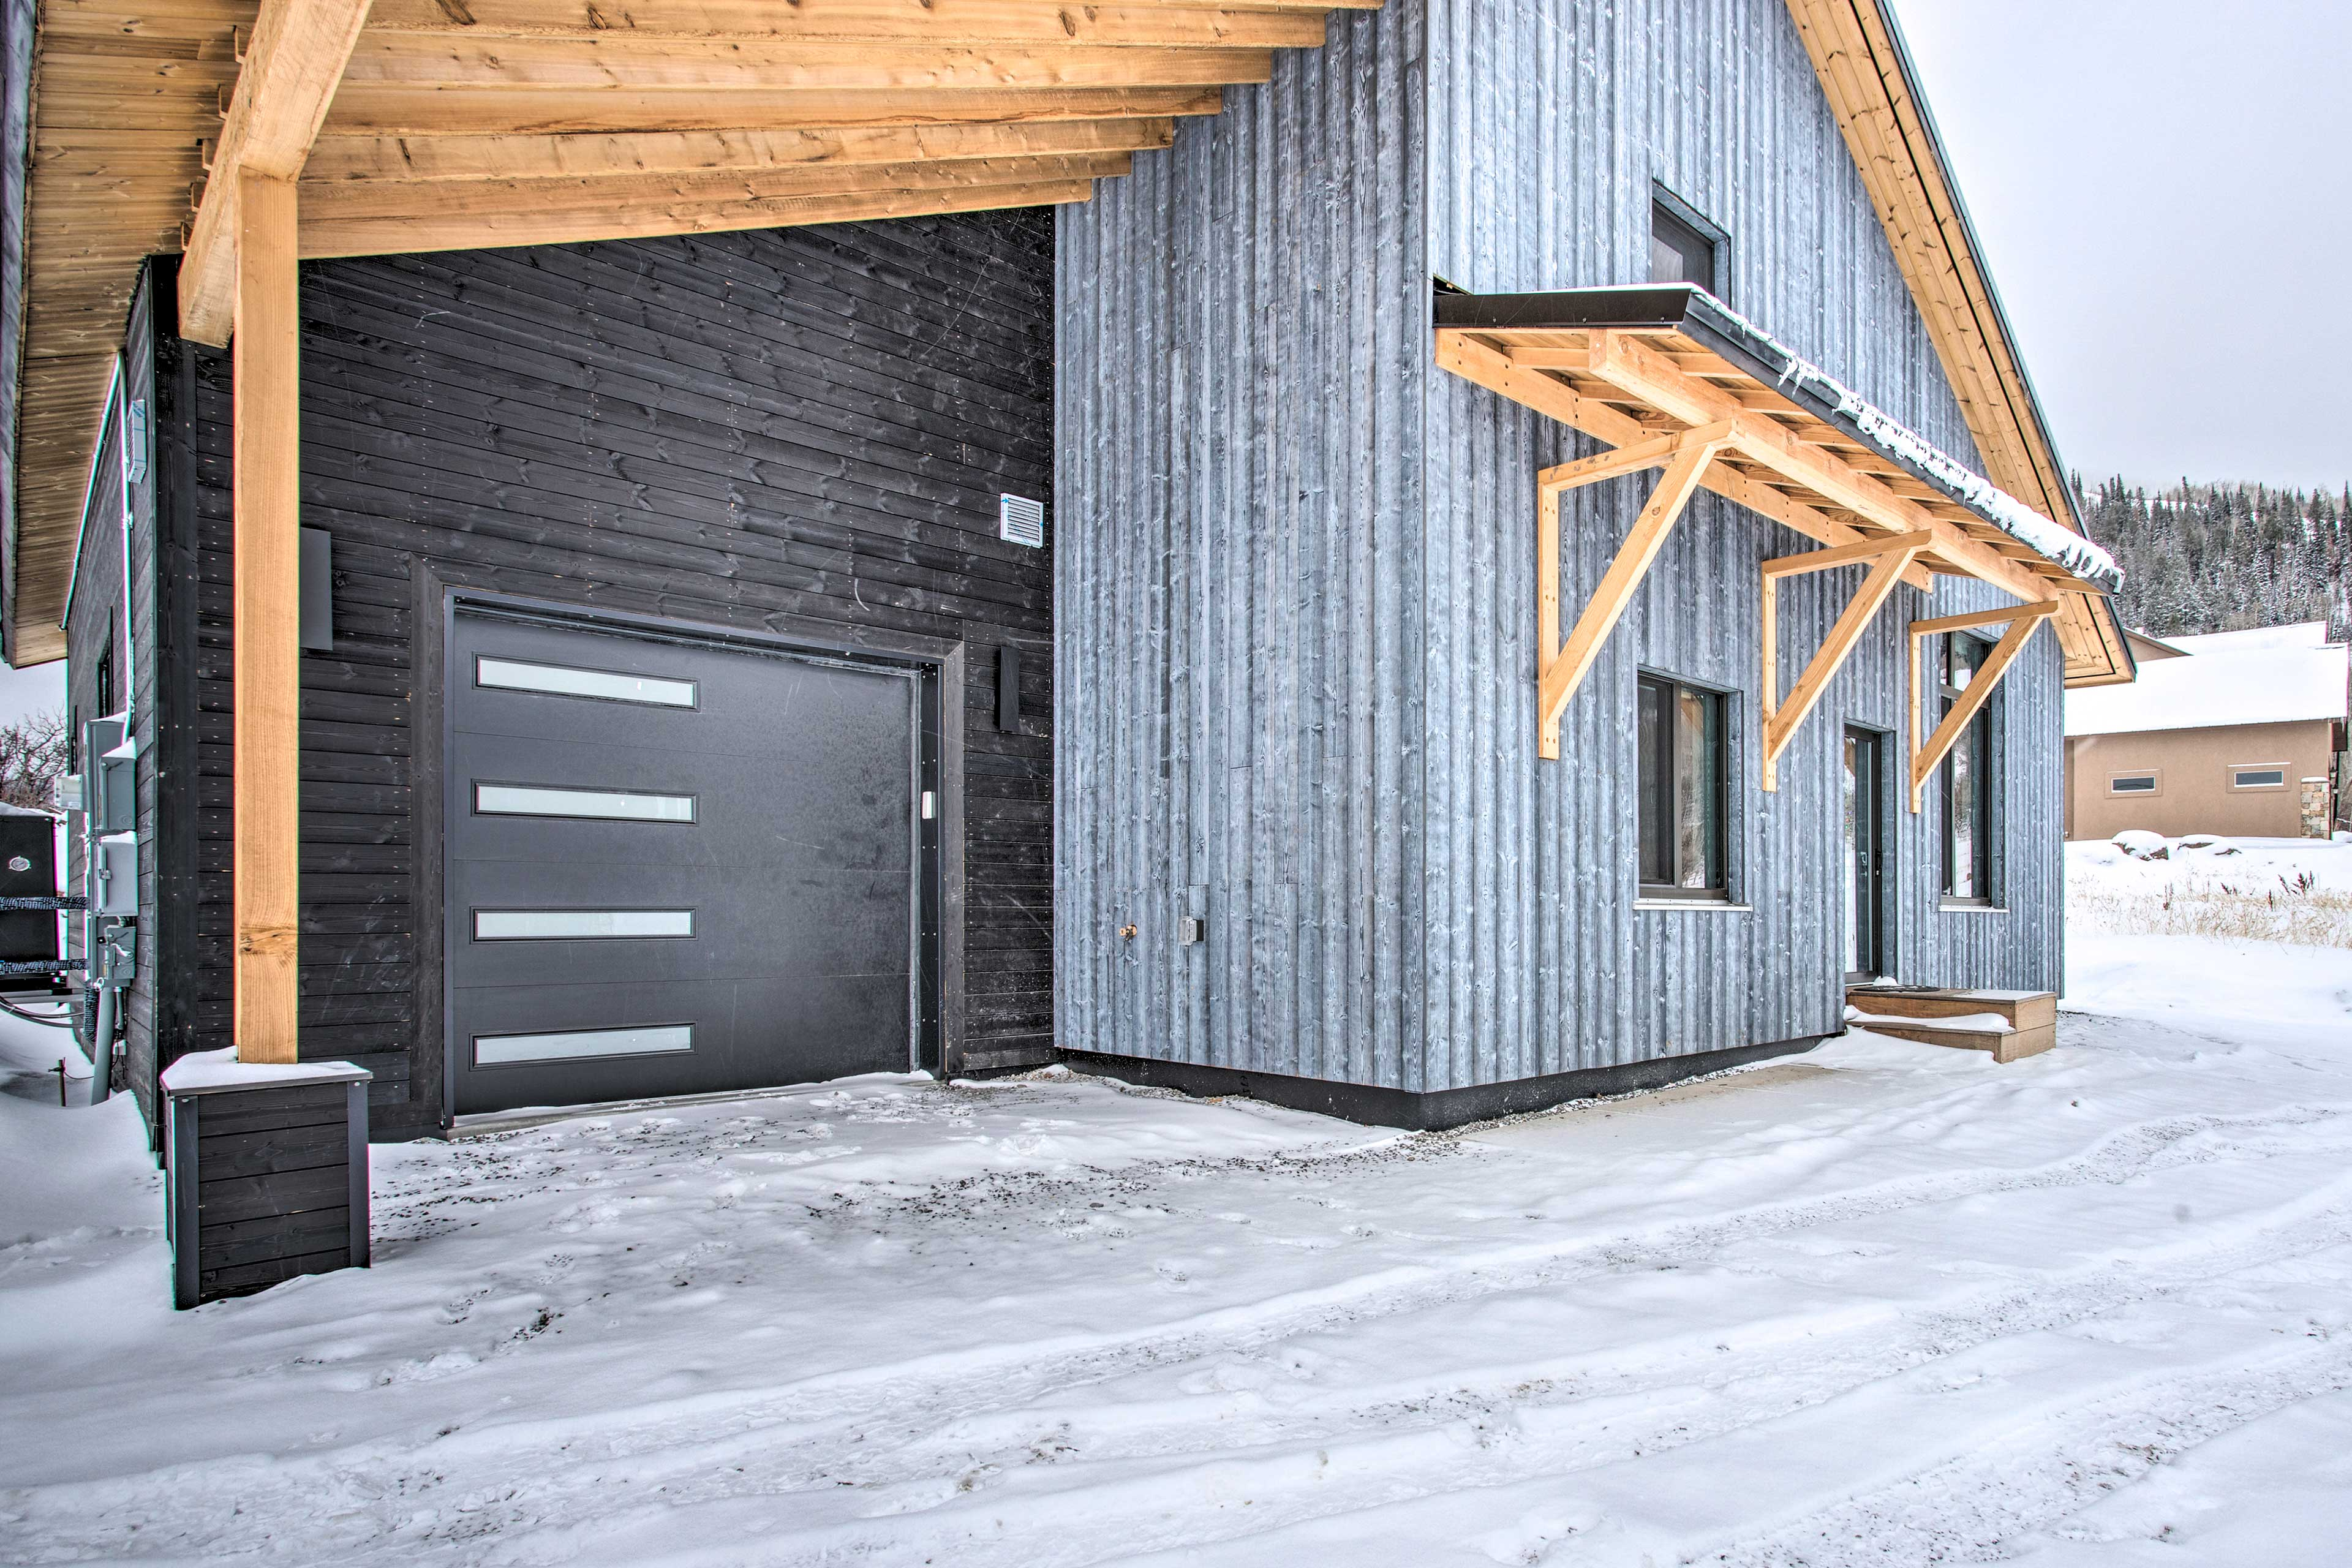 House Exterior | Garage Parking | 1 Vehicle